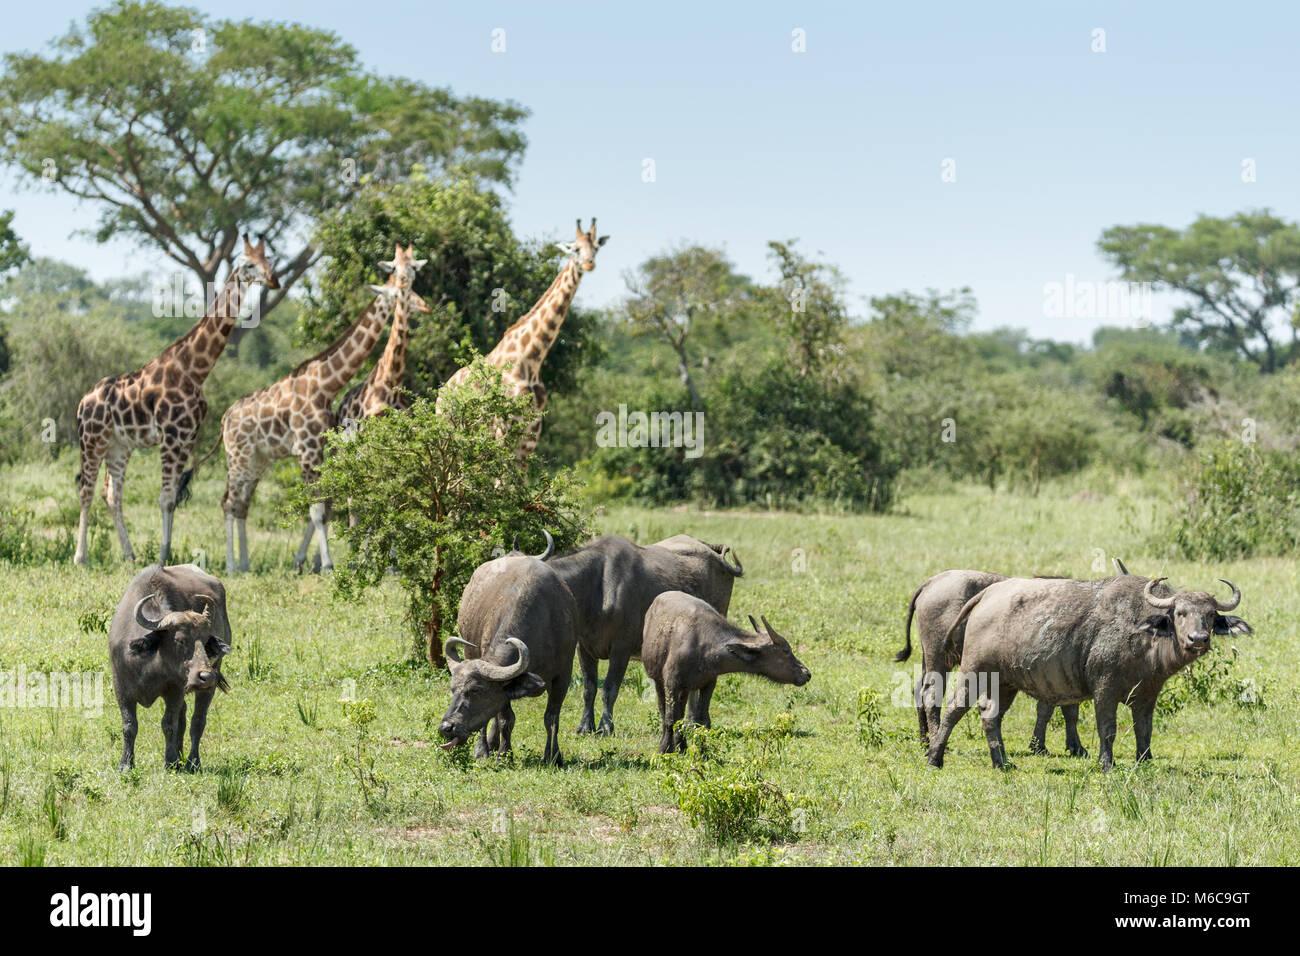 Rothschild's giraffe (Giraffa camelopardalis rothschildi) African buffalo or Cape buffalo (Syncerus caffer) - Stock Image